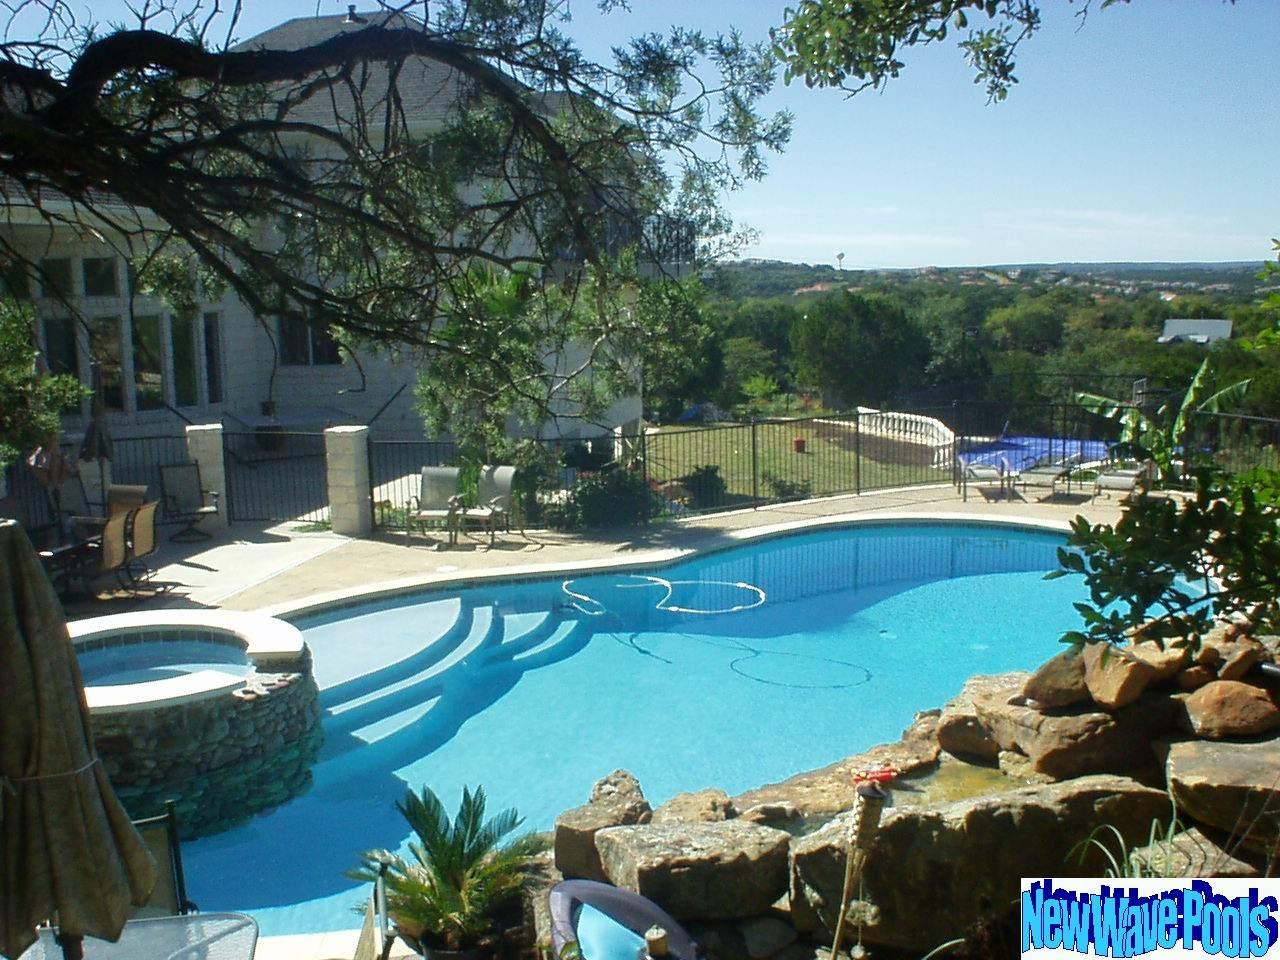 spa swimming pools photos home pool designs designer pools and spasdesigner pools outdoor living central texas pool builder austin. Interior Design Ideas. Home Design Ideas